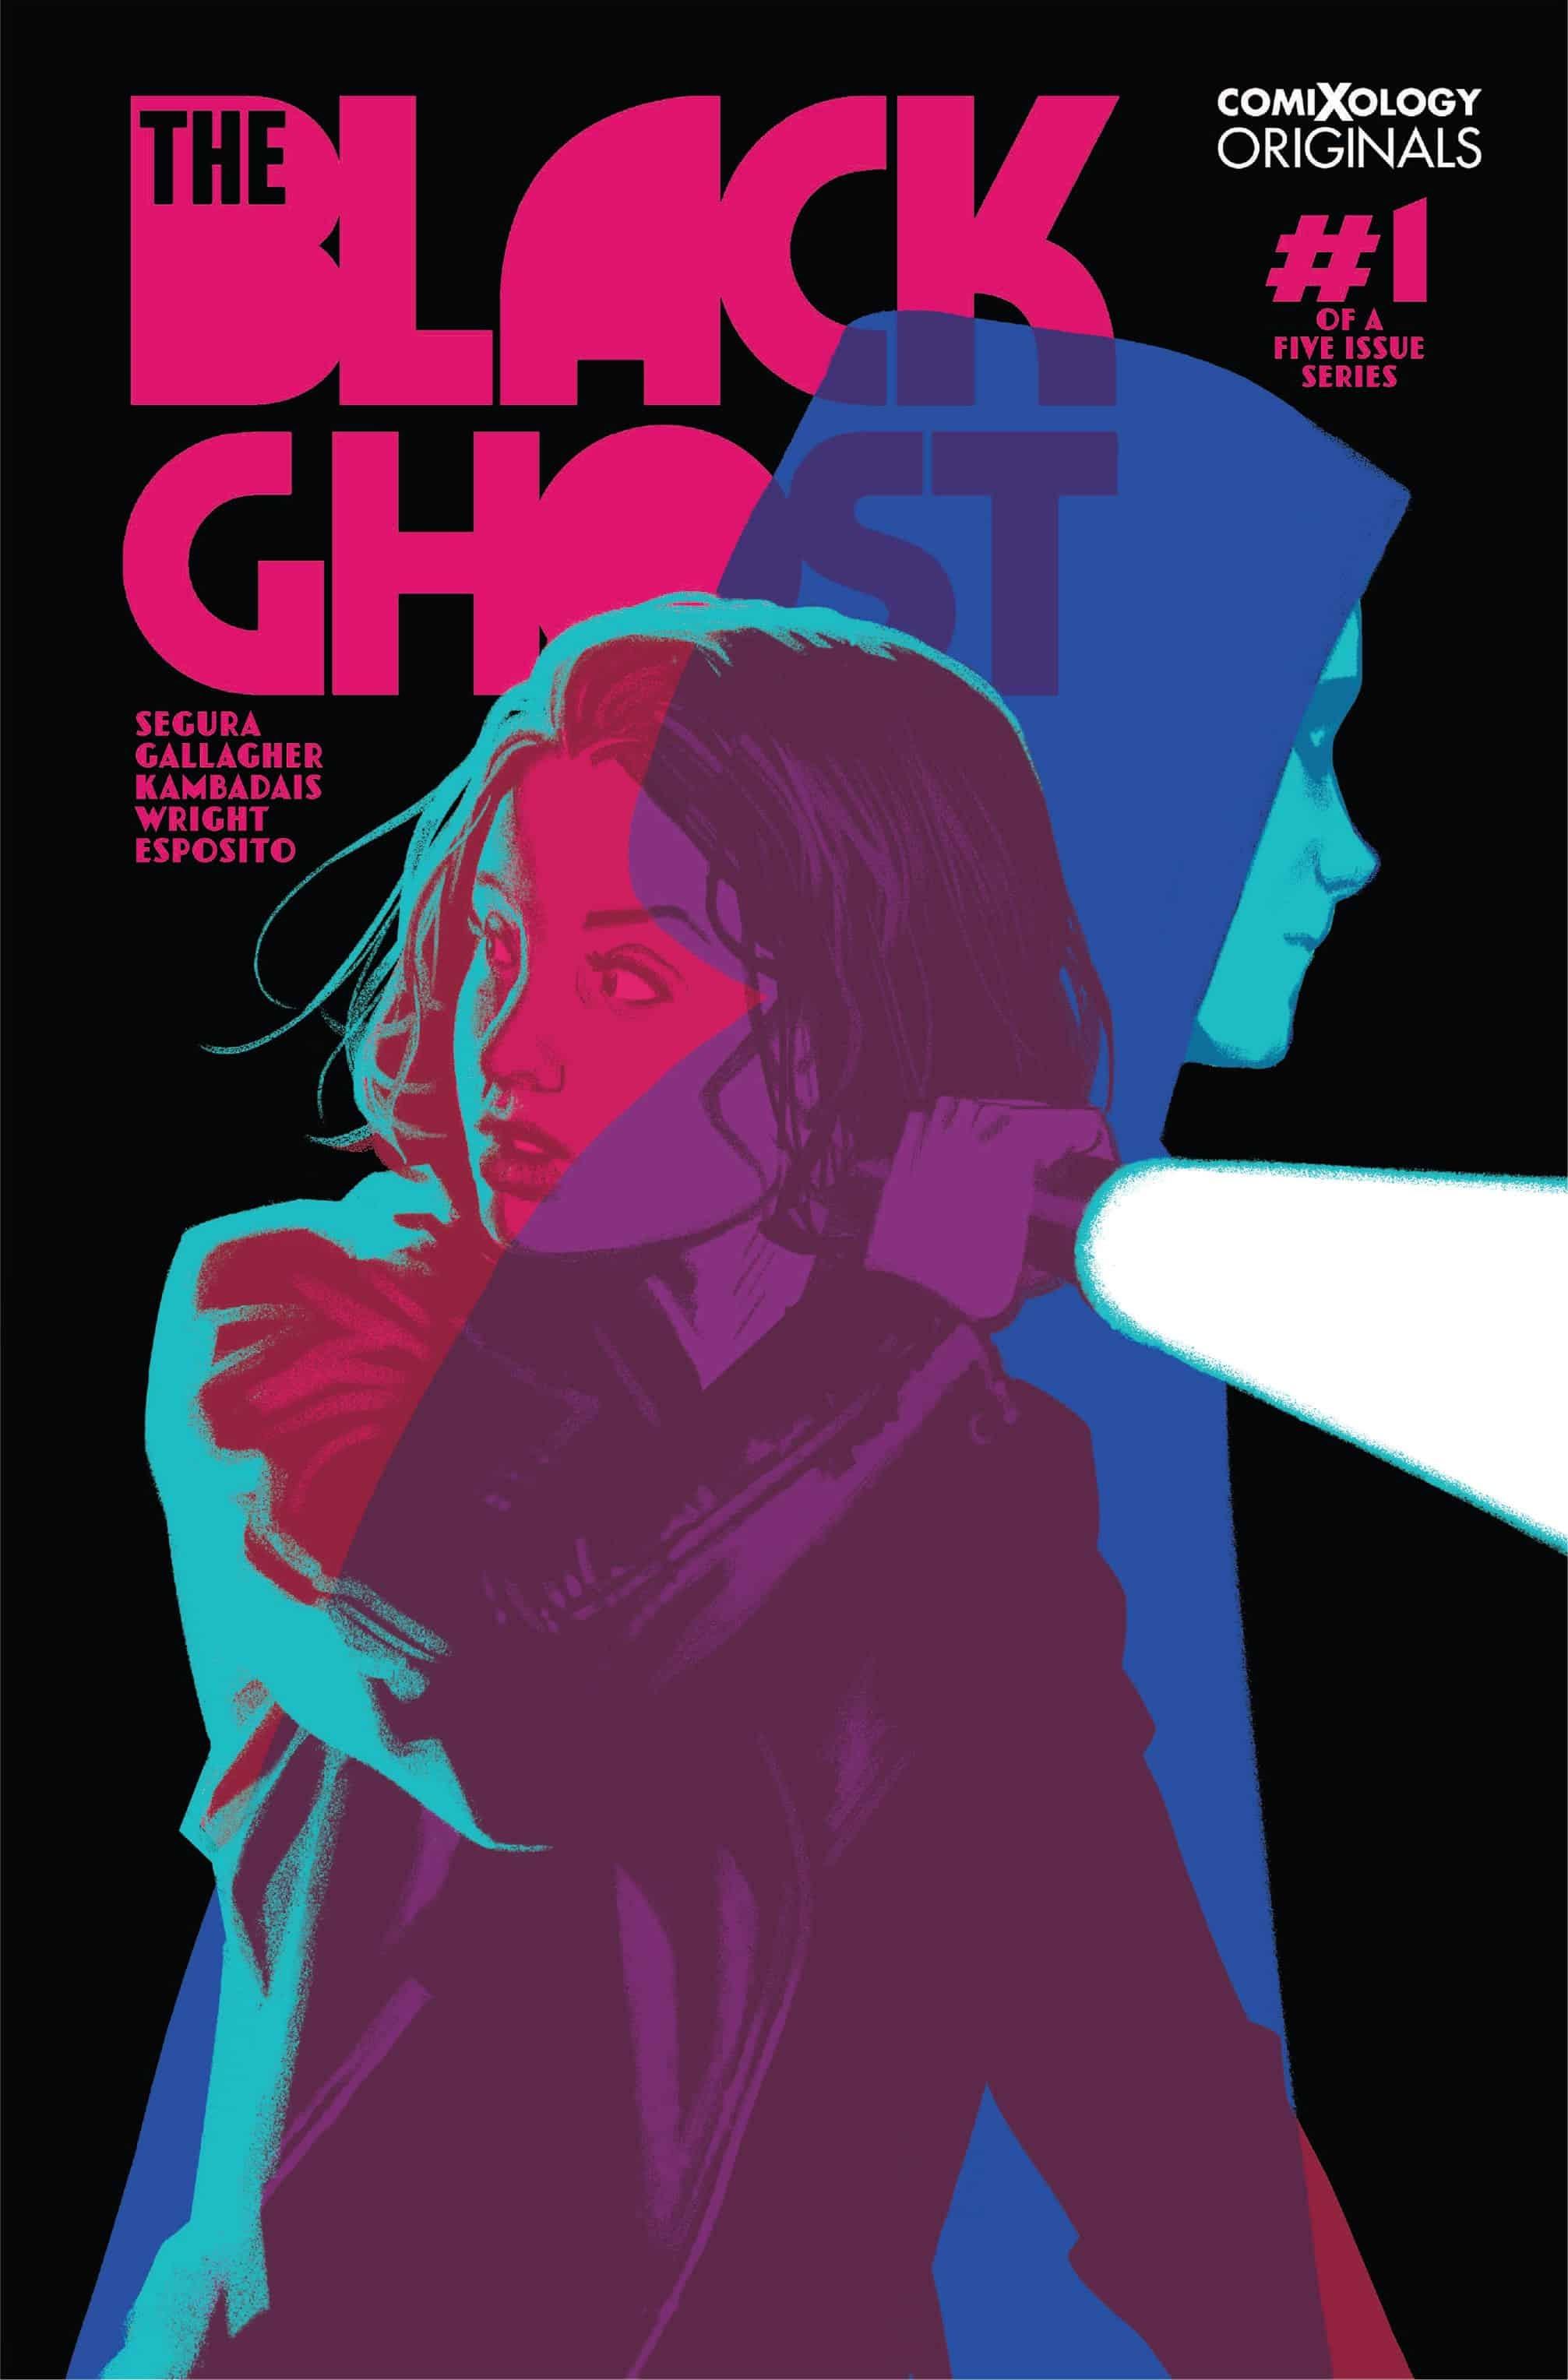 Black Ghost #2, Comixology